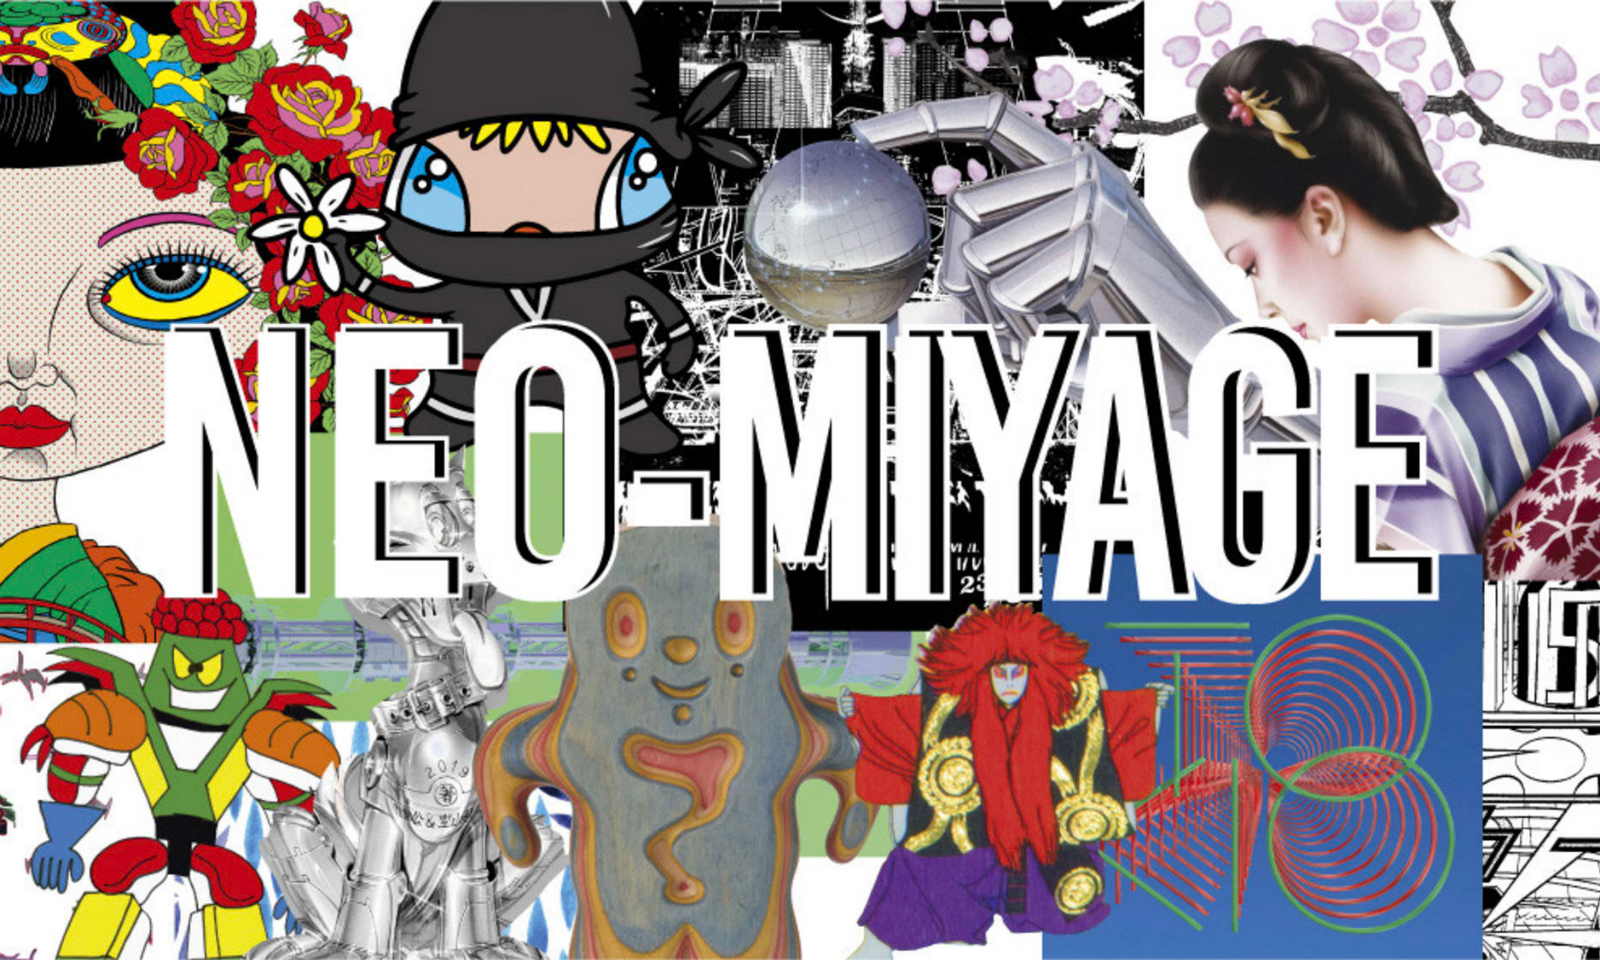 UNIQLO UT 与涩谷美术馆带来全新联名企划